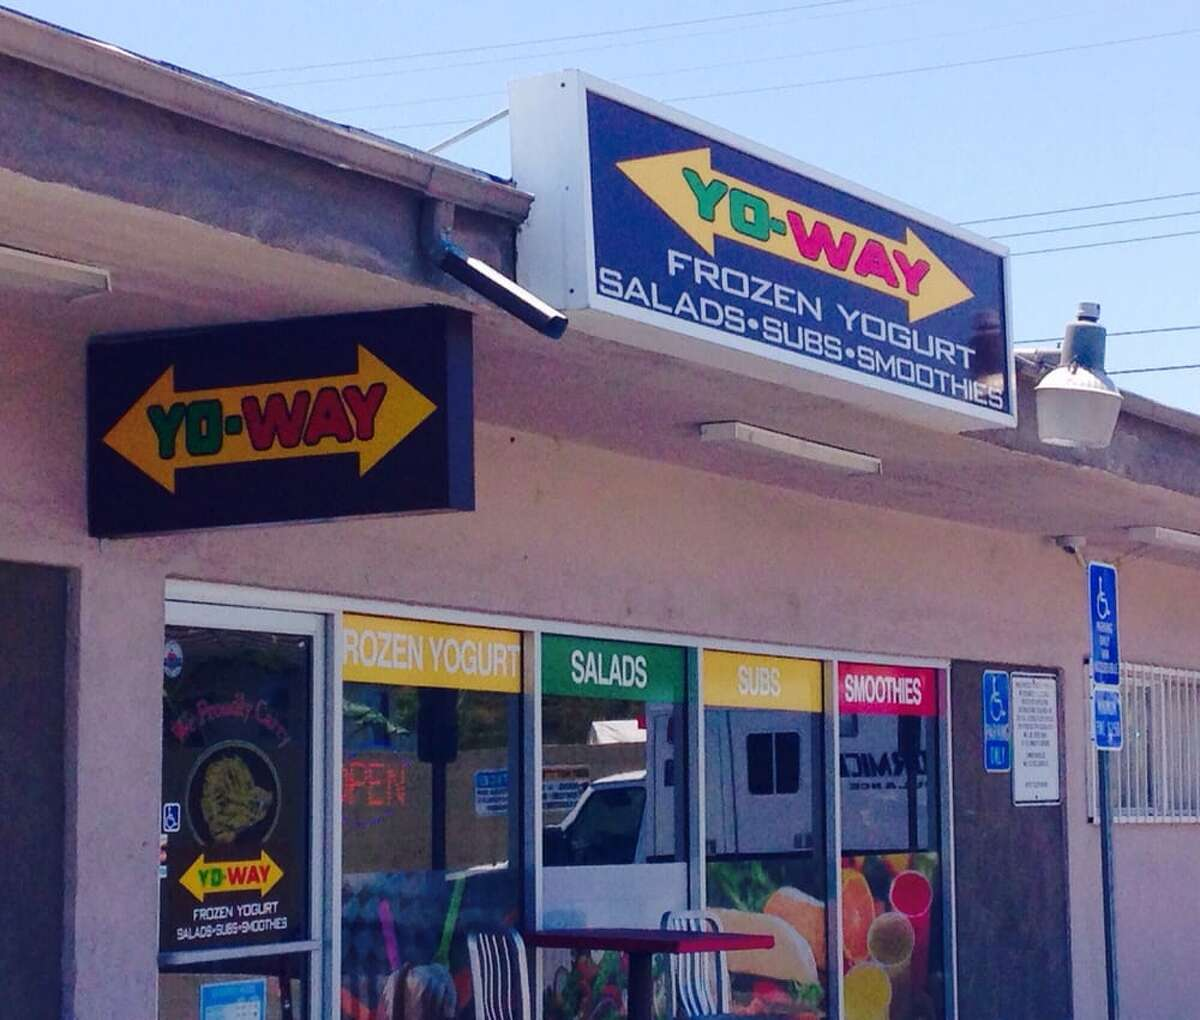 Place name: Yo-WayYelp ranking: 13Location: Gardena, Calif. Photo: Michael D. /Yelp